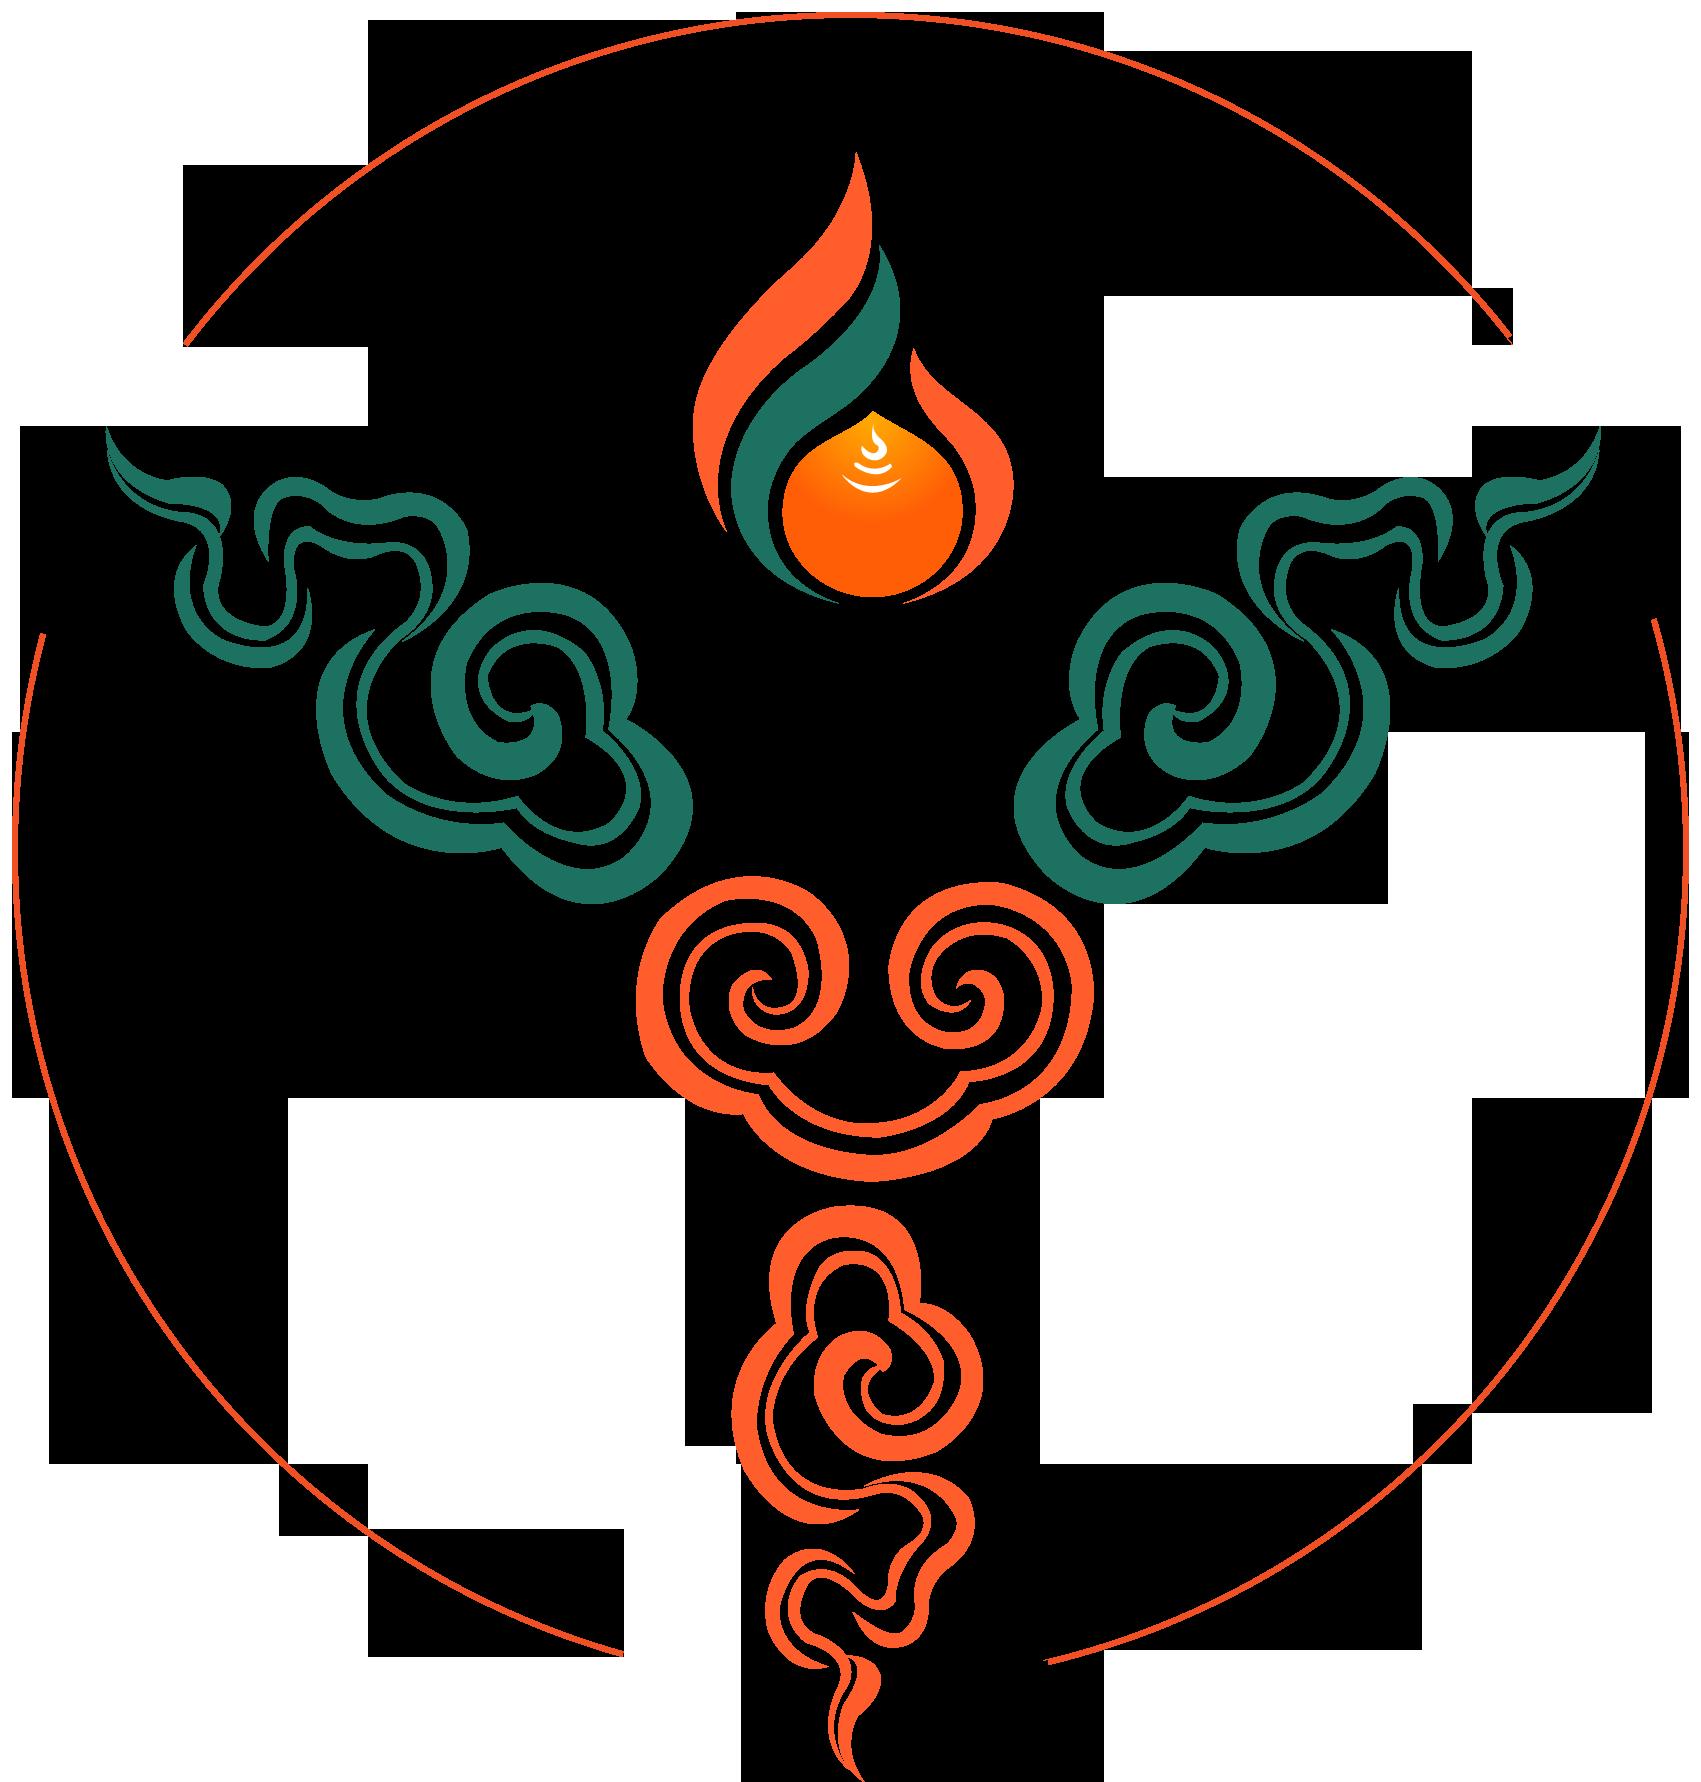 Yarab Institute for Hospitality Management (YIHM) : Building hospitality leaders